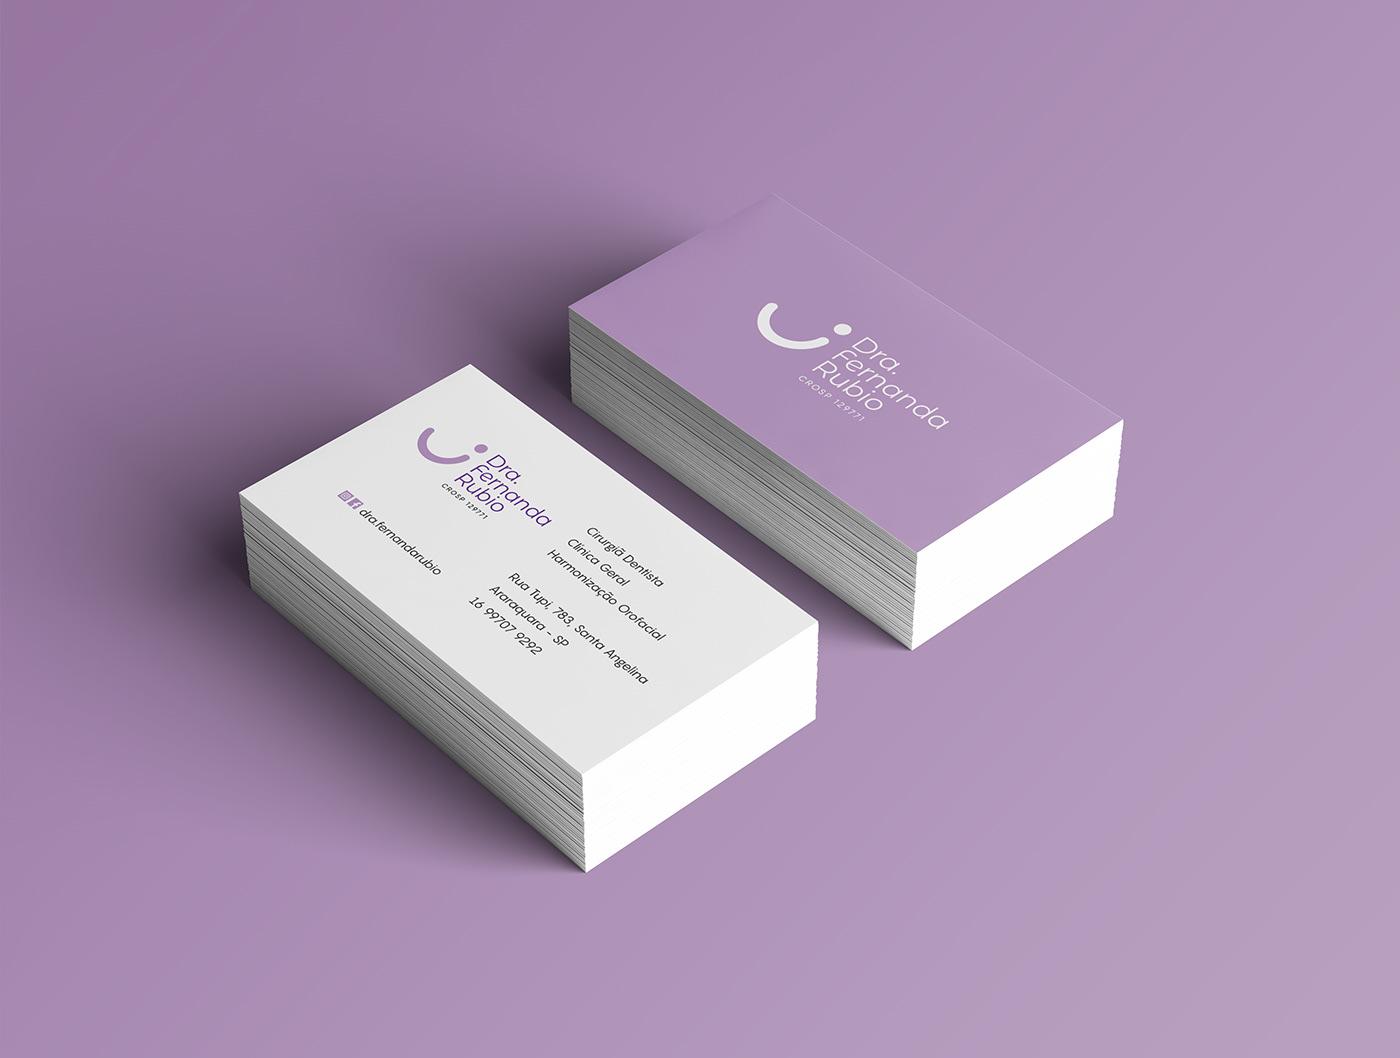 branding  logo identidade visual papelaria business card Stationery